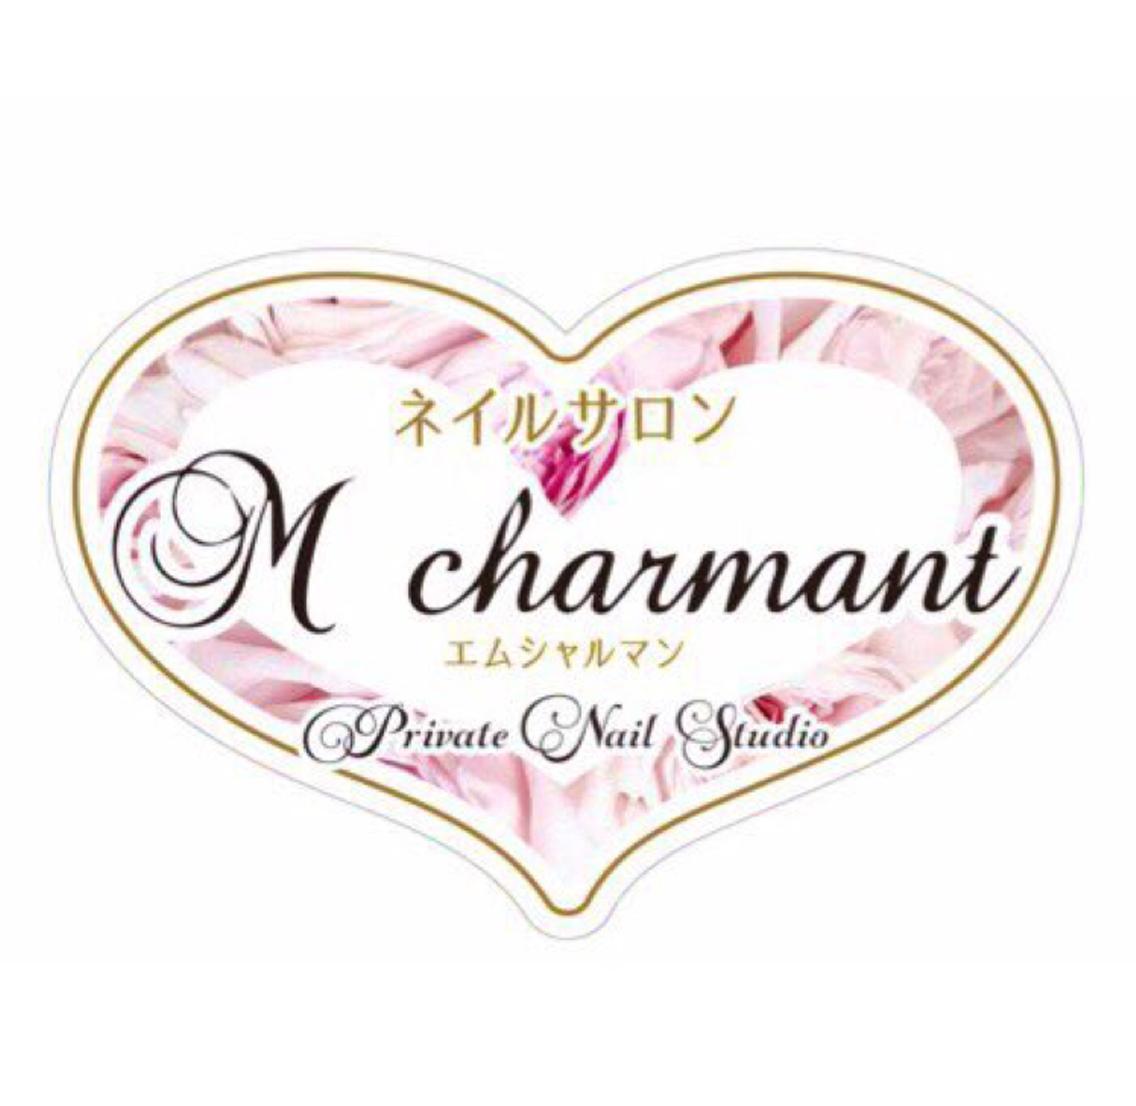 Mcharmant所属・Mcharmant流山おおたかの森の掲載